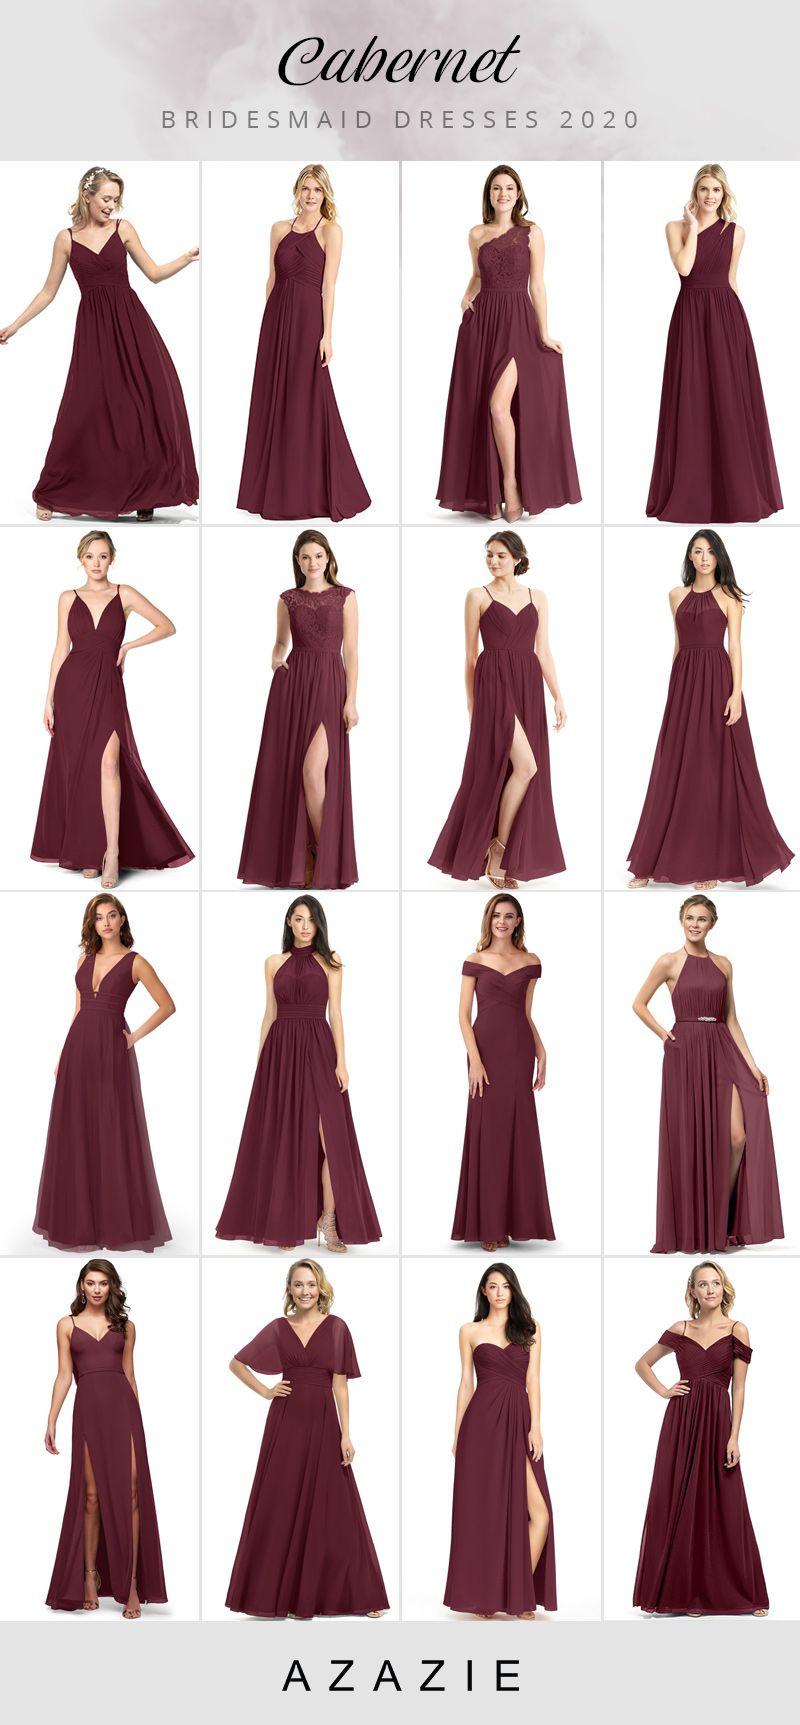 Cabernet Bridesmaid Dresses At Affordable Prices In 2020 Fall Bridesmaid Dresses Burgundy Bridesmaid Dresses Bridesmaid Dresses